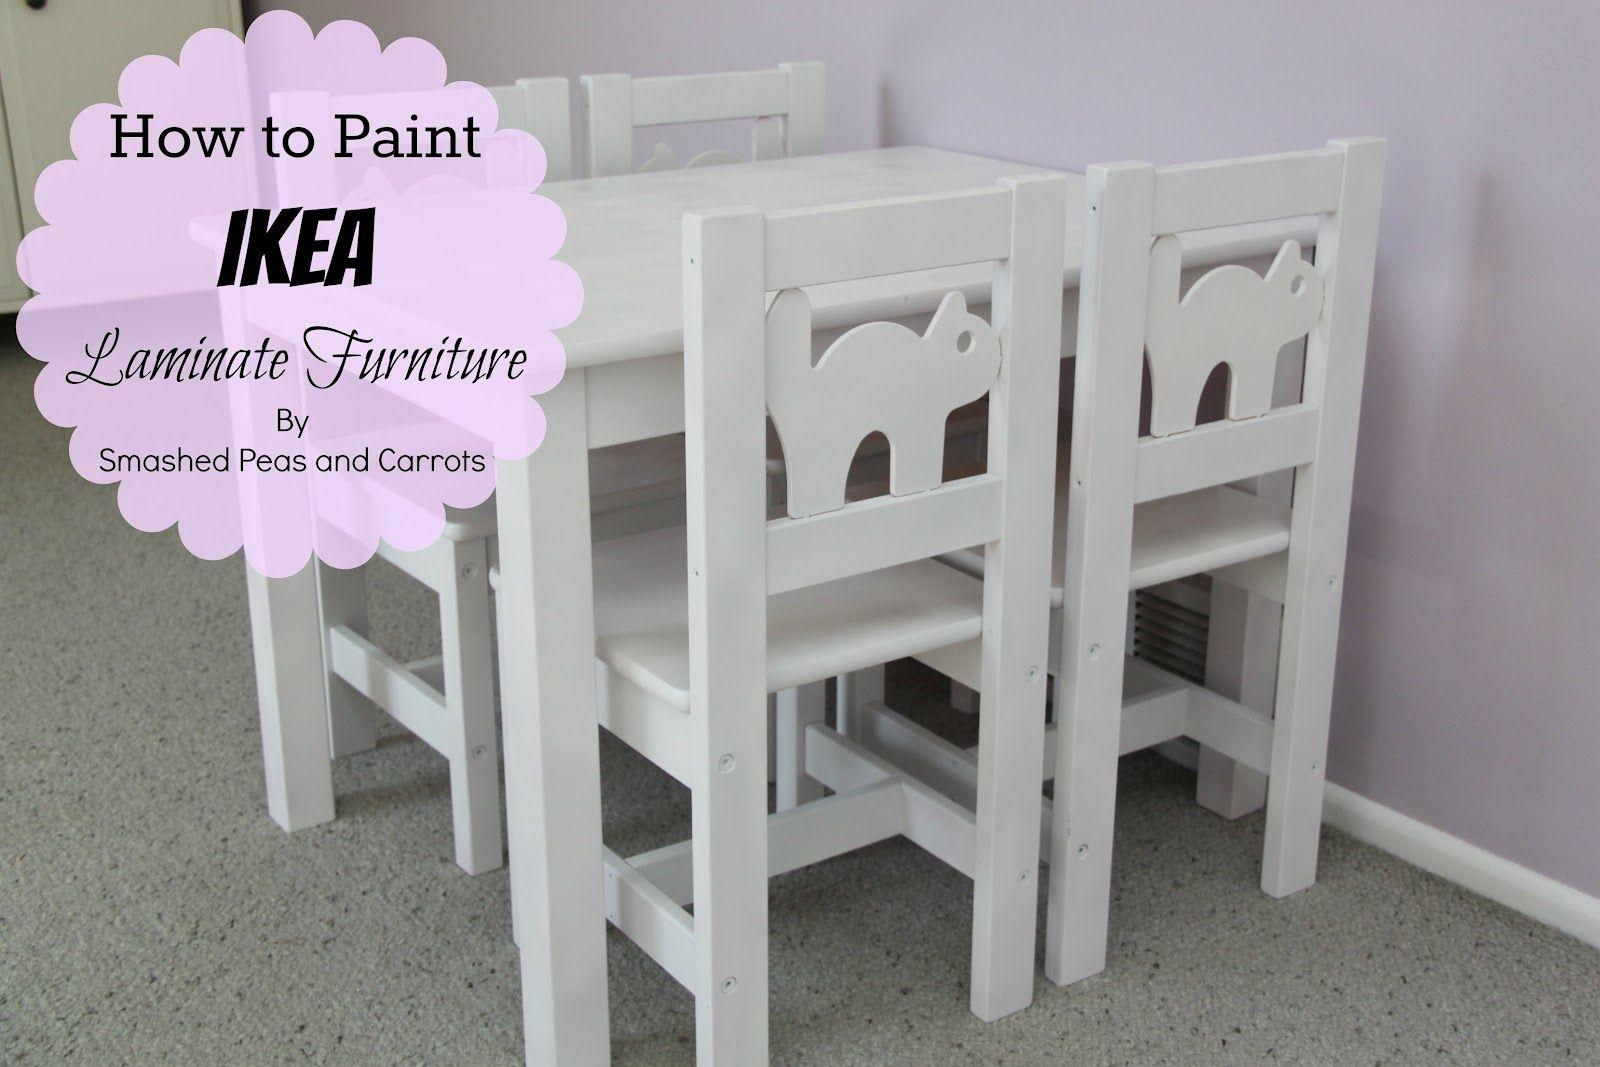 How To Paint Ikea Laminate Furniture Useful Household